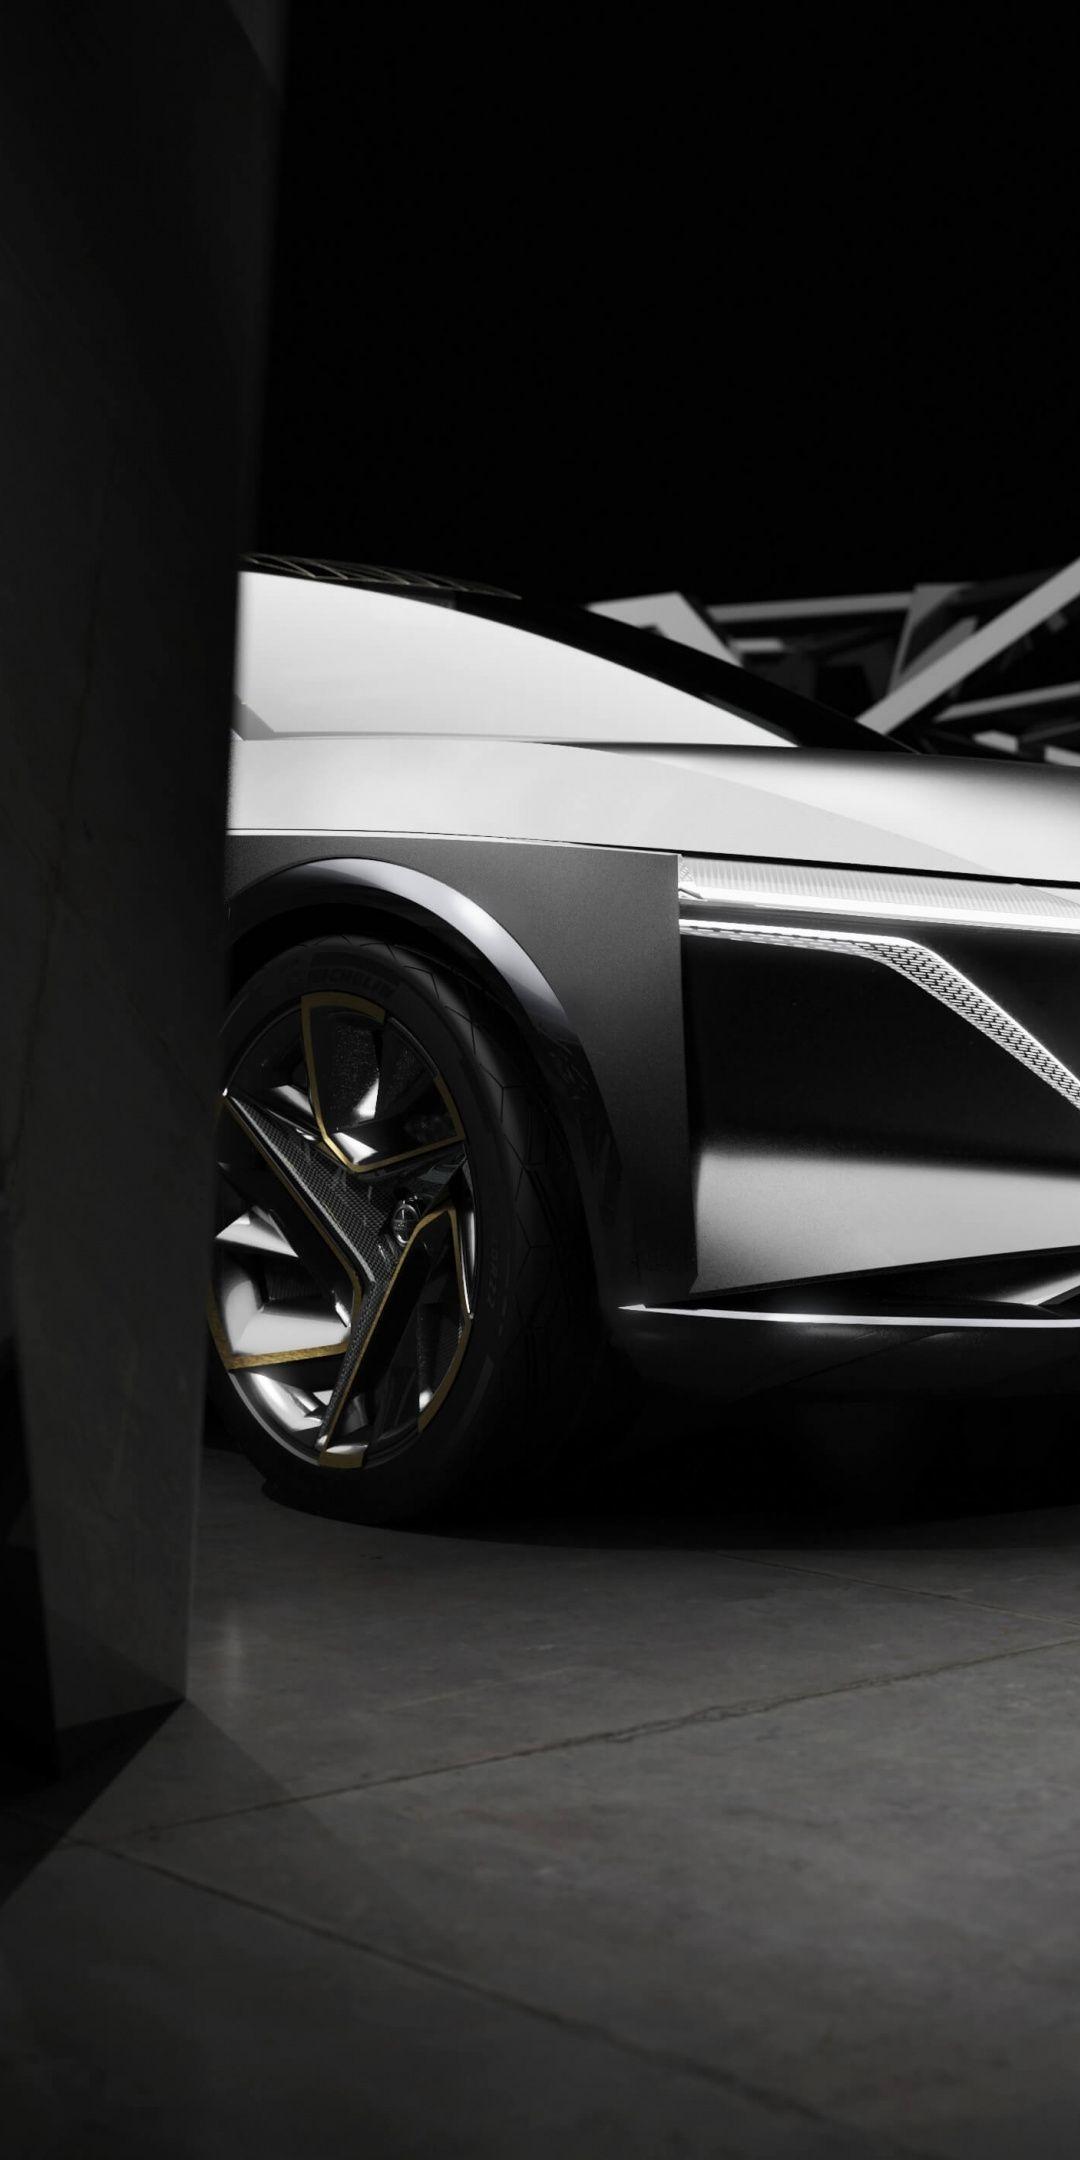 Nissan Ims Concept Electric Car 1080x2160 Wallpaper Car